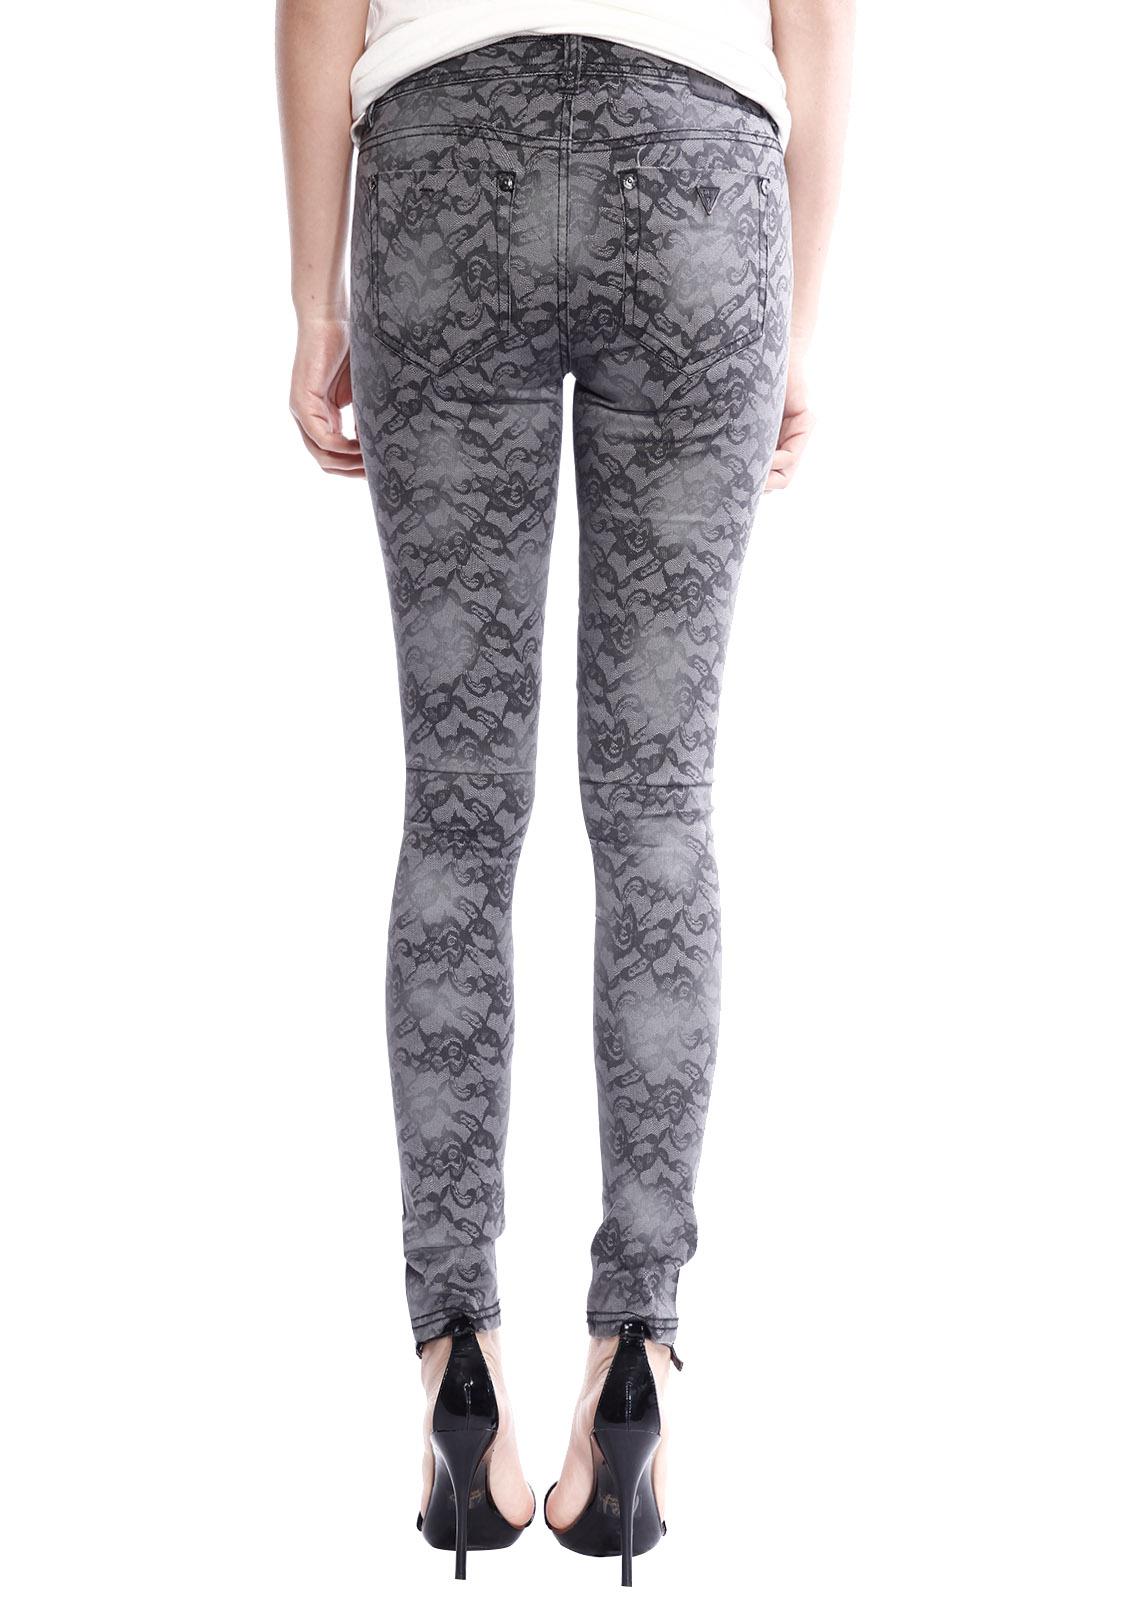 womens low waist lace print skinny jeans slim fit pencil. Black Bedroom Furniture Sets. Home Design Ideas